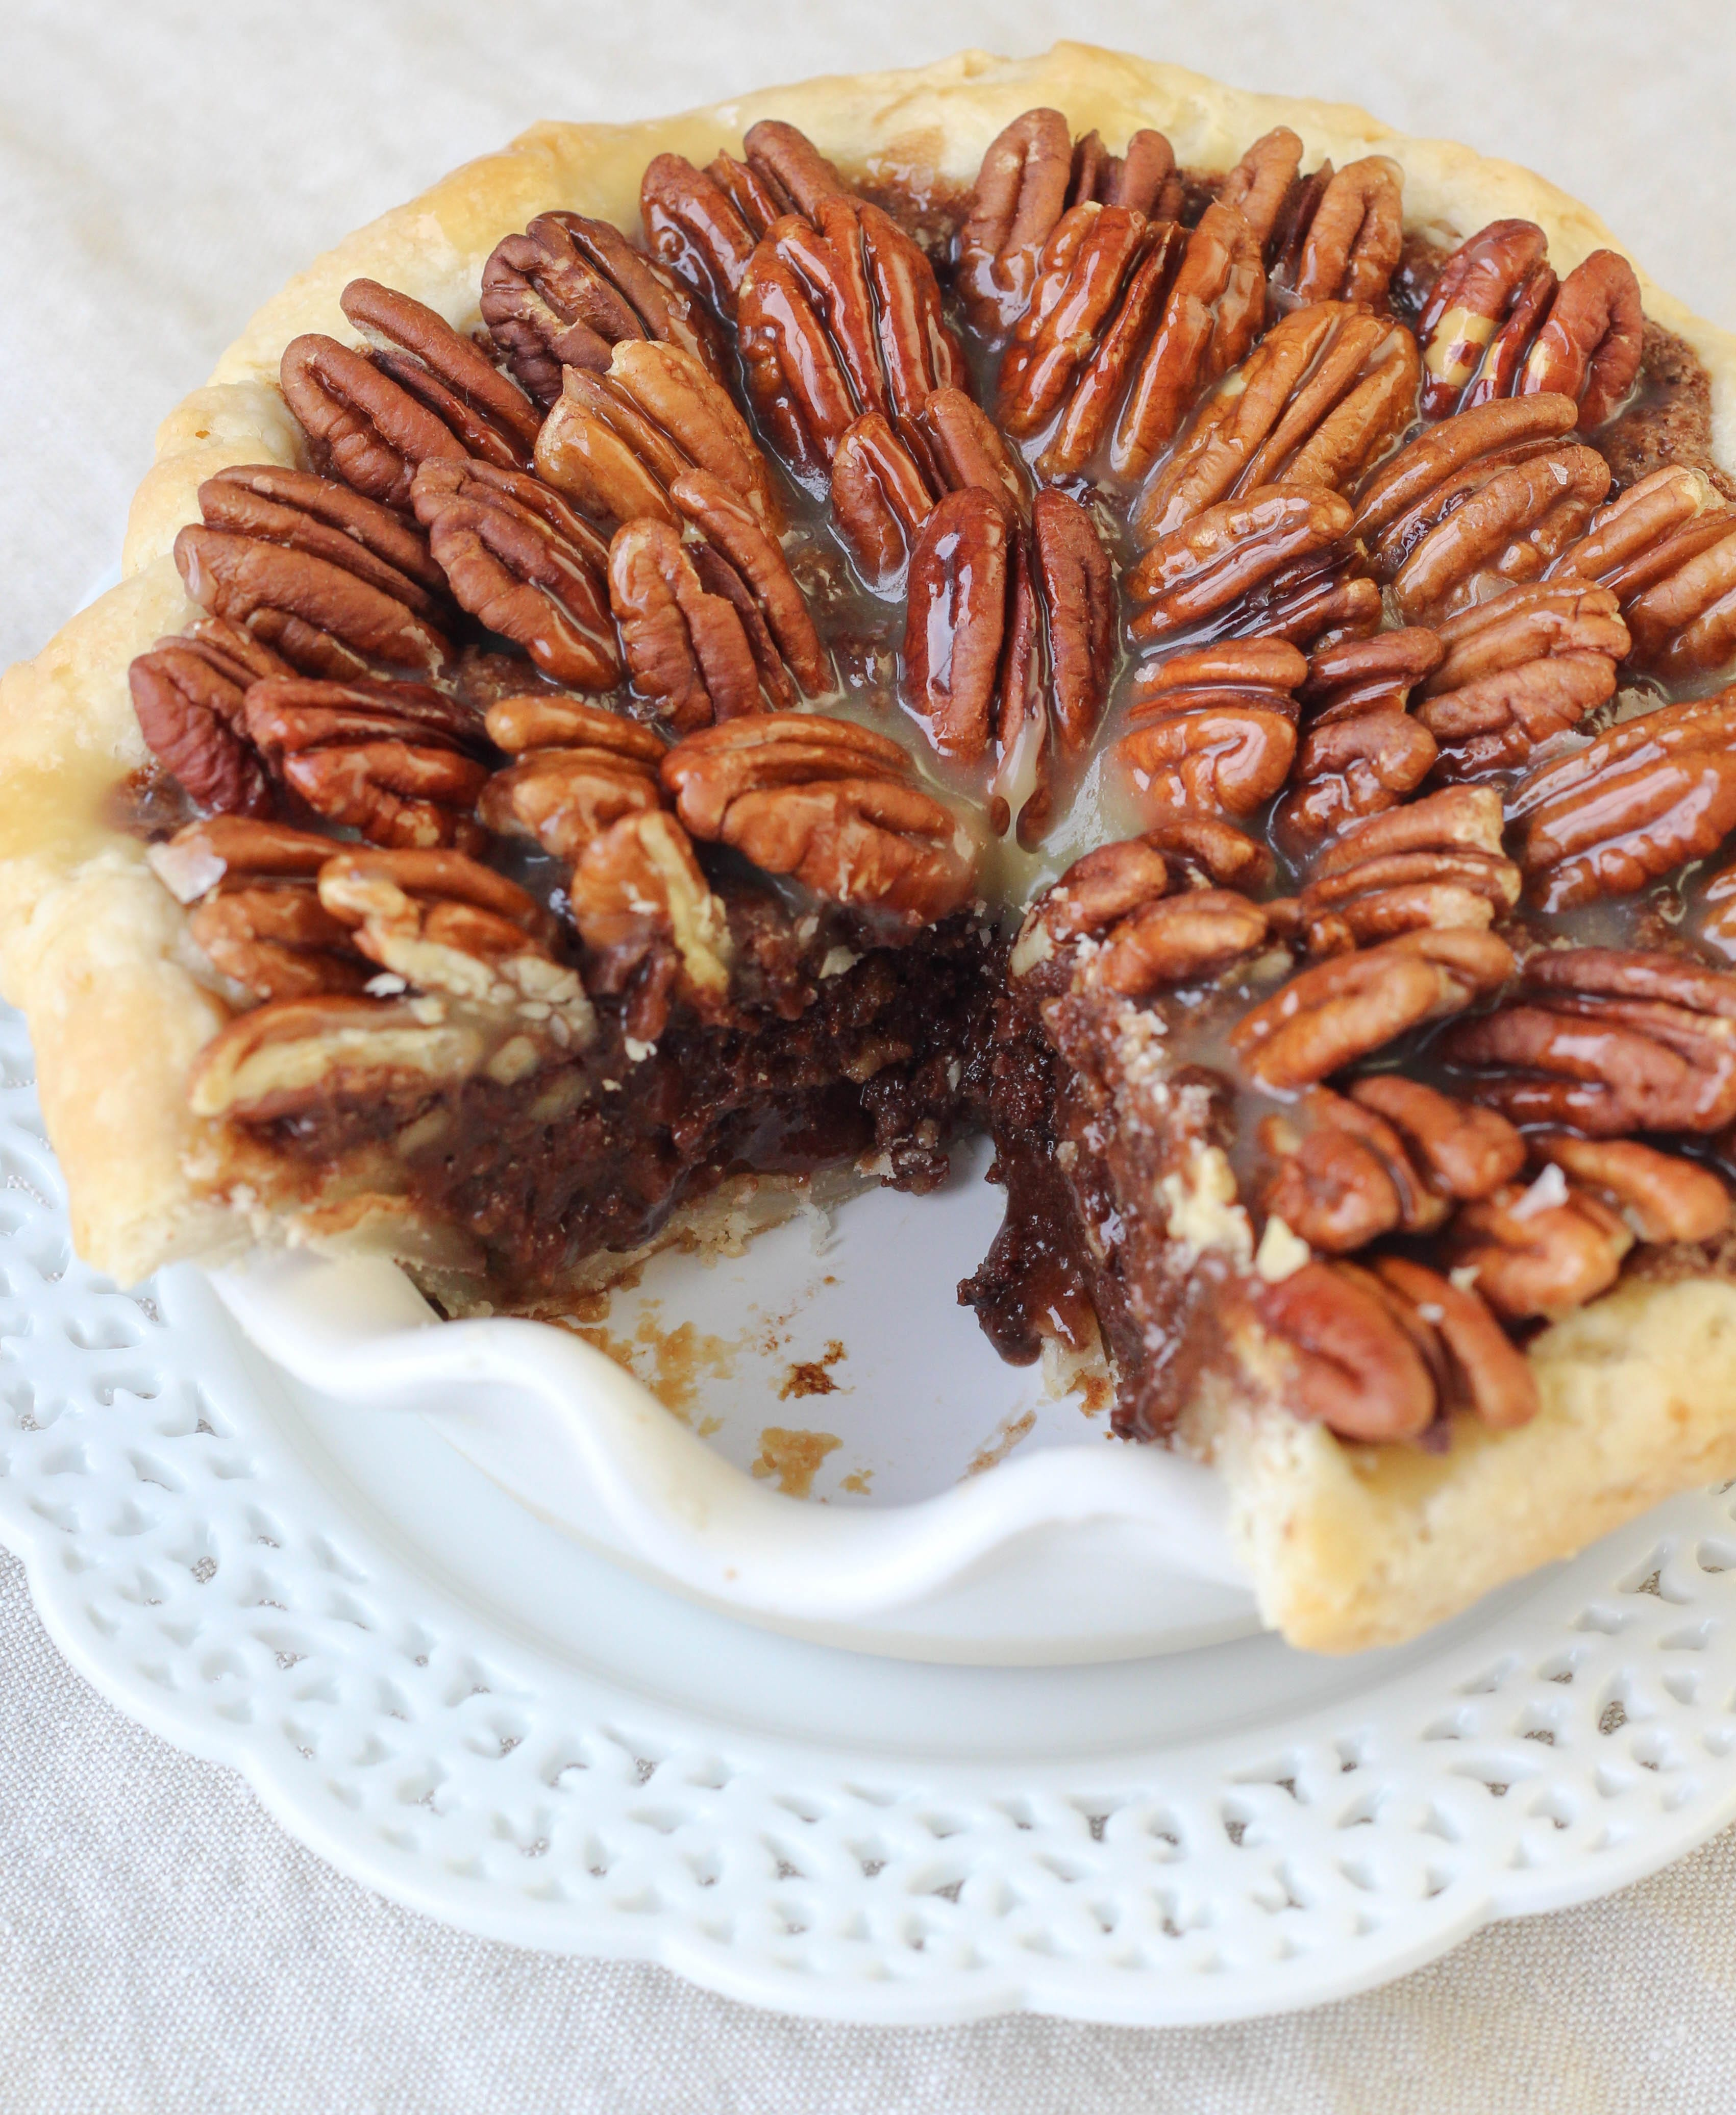 Salted Caramel Chocolate Pecan Pie - American Heritage Cooking